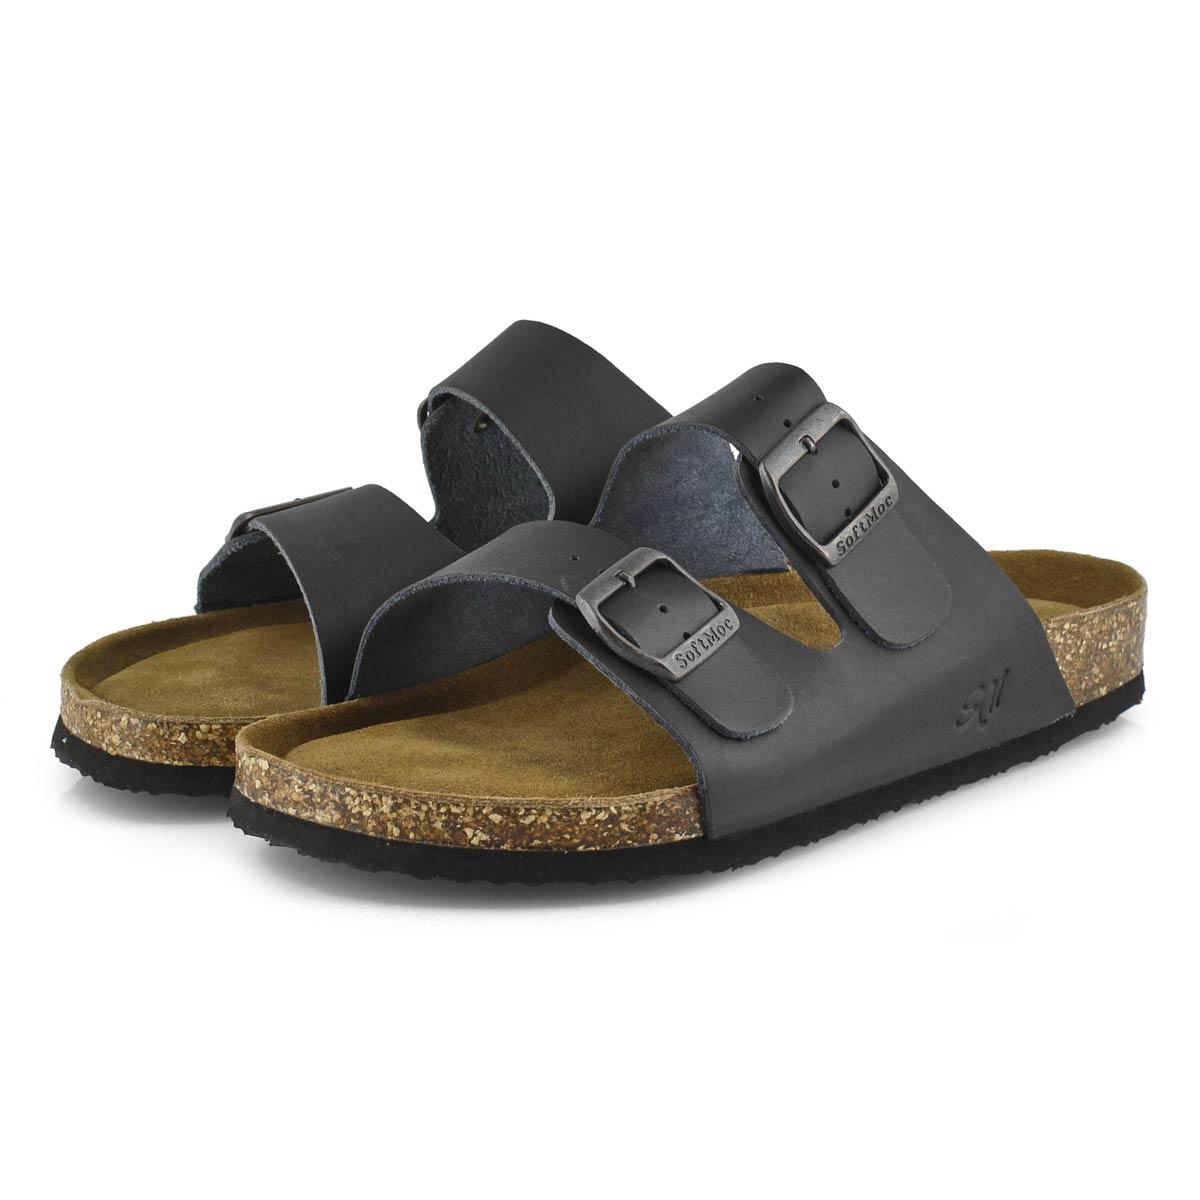 Mns Randy 5 blk memory foam slide sandal